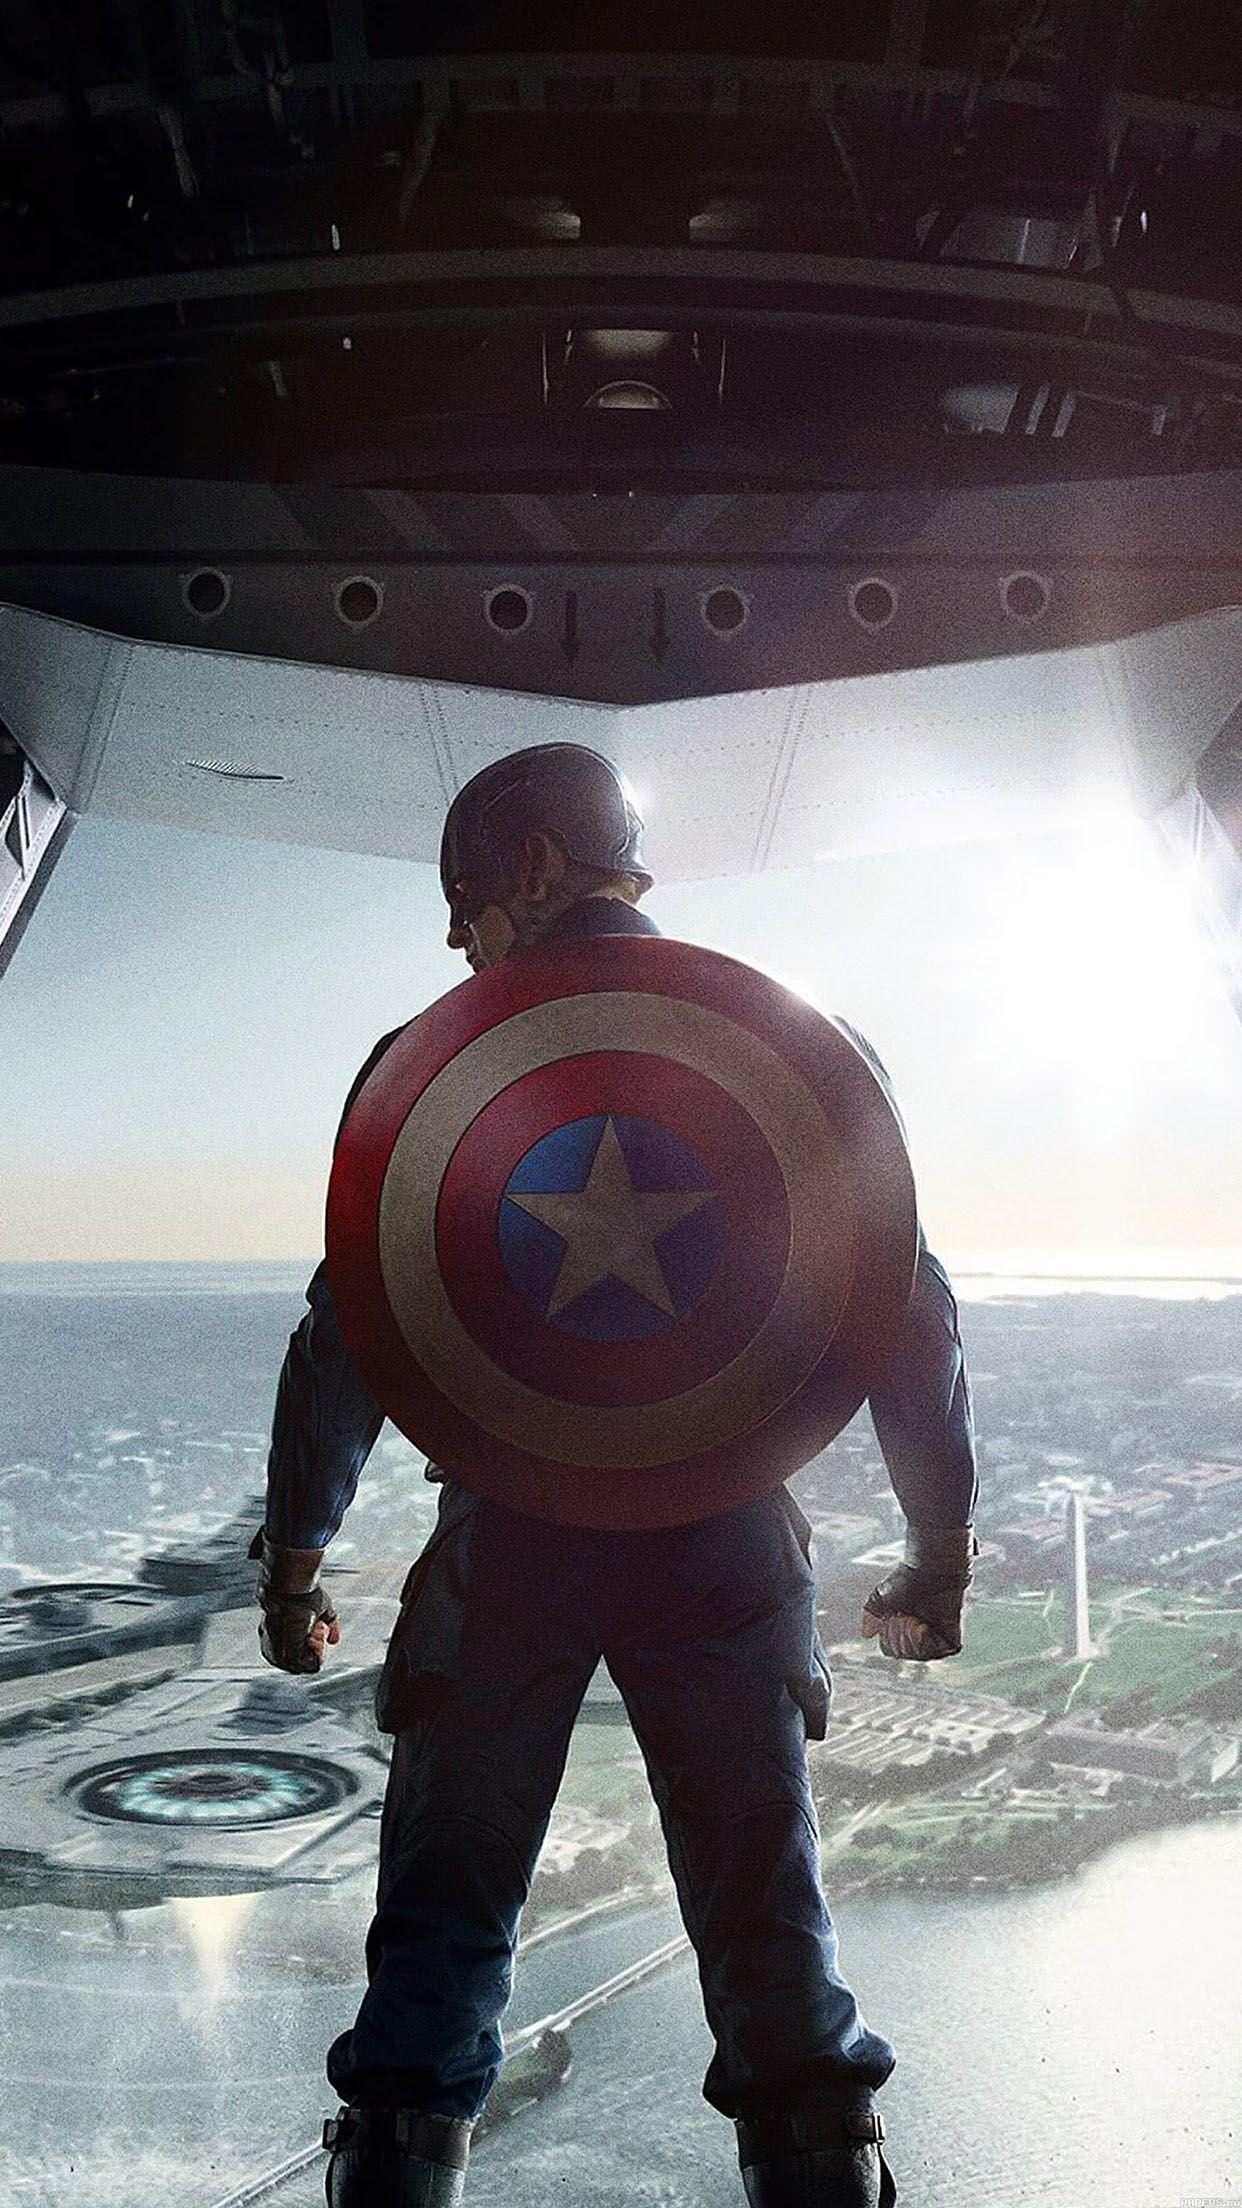 For Geeks Captain America With Shield Colorful Dark Strong Superhero Marvel Avenger Comics Washington HD IPhone 6 Plus Wallpaper